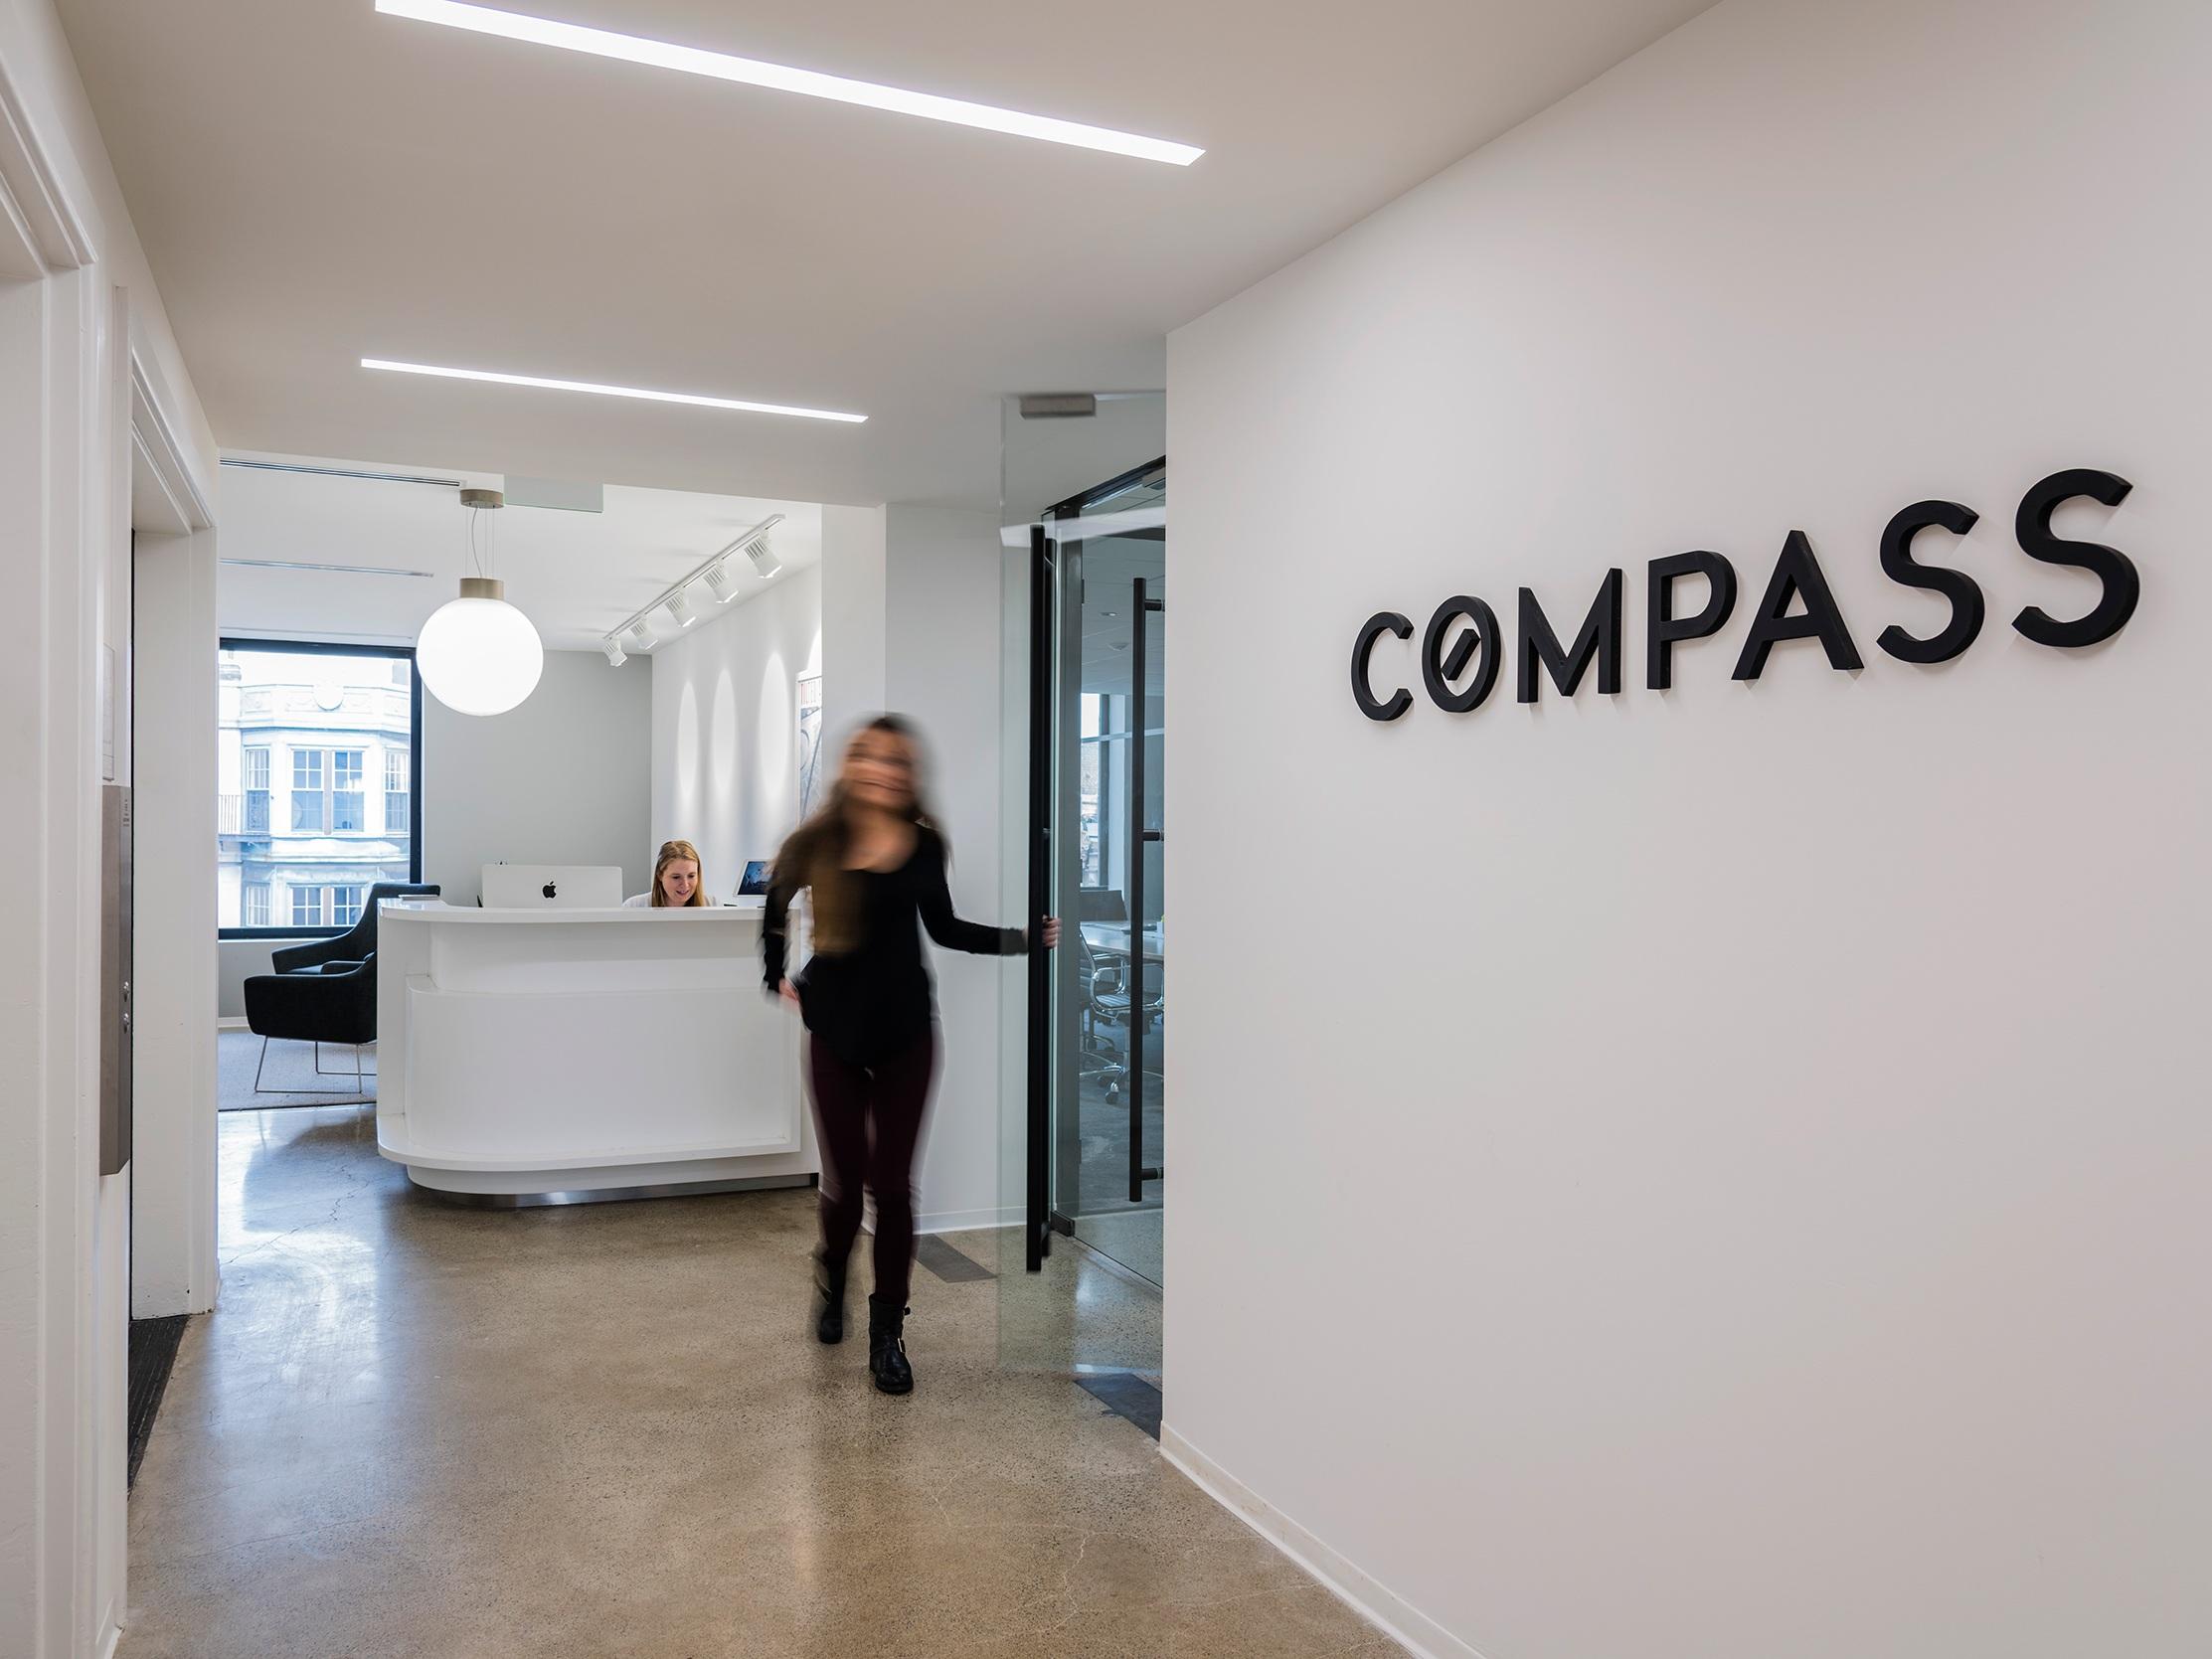 Compass - Newbury Street